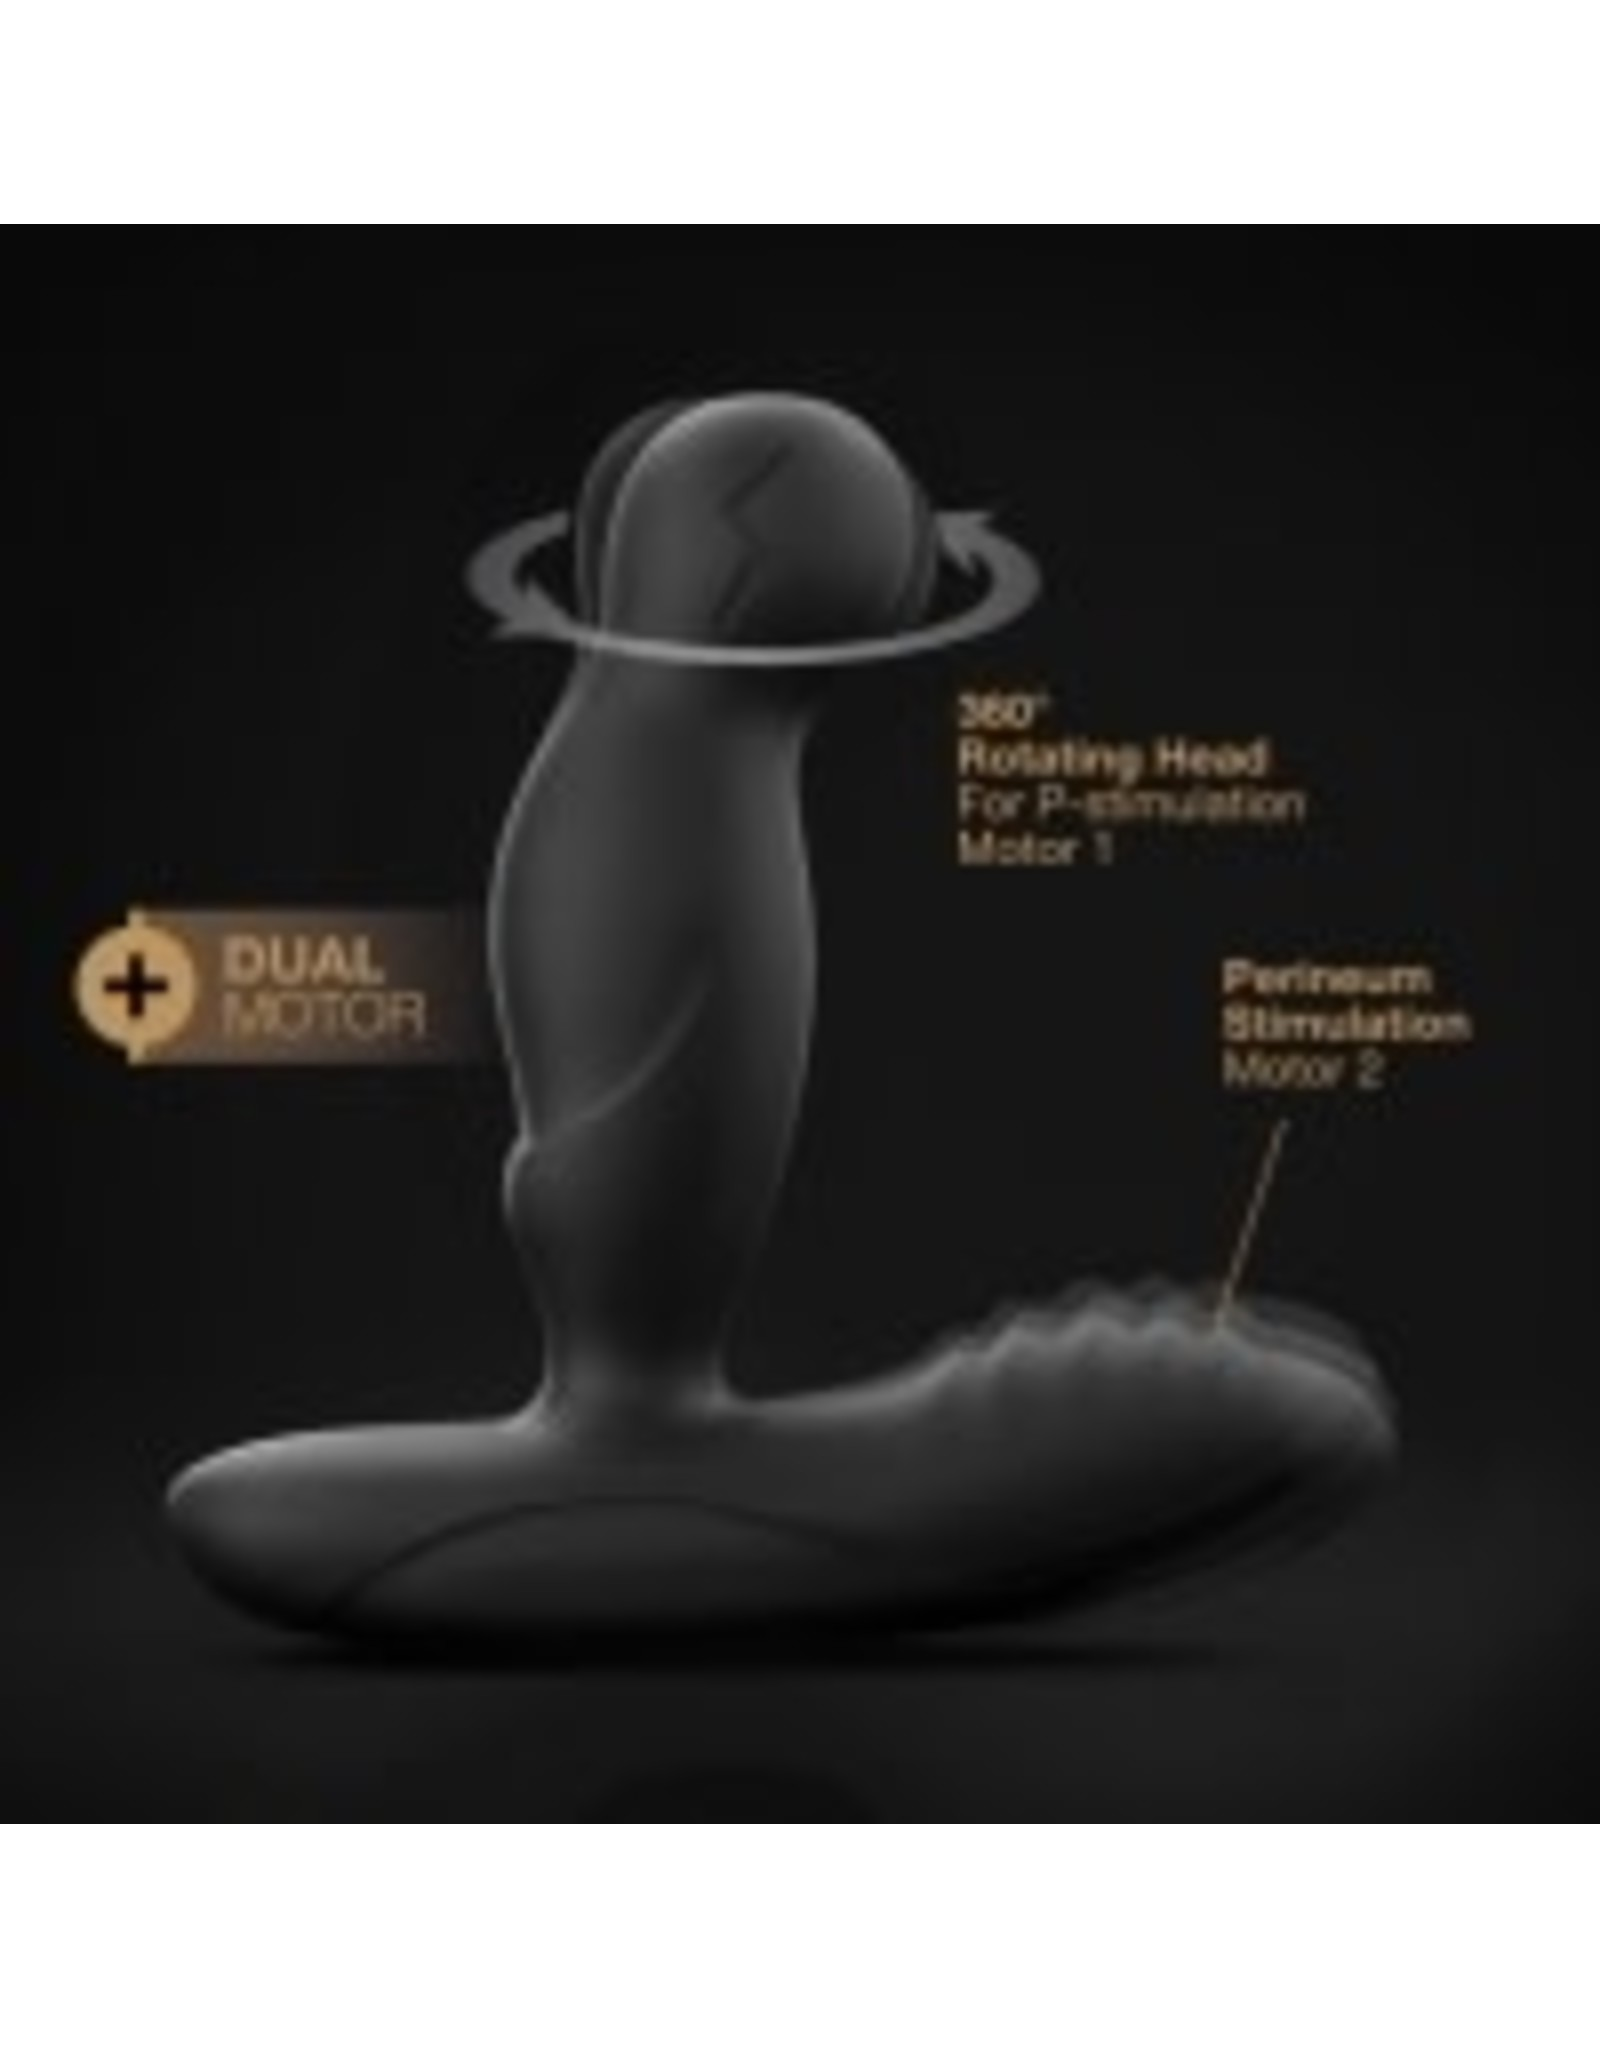 Dorcel - P-Swing Rotating Prostate Massager